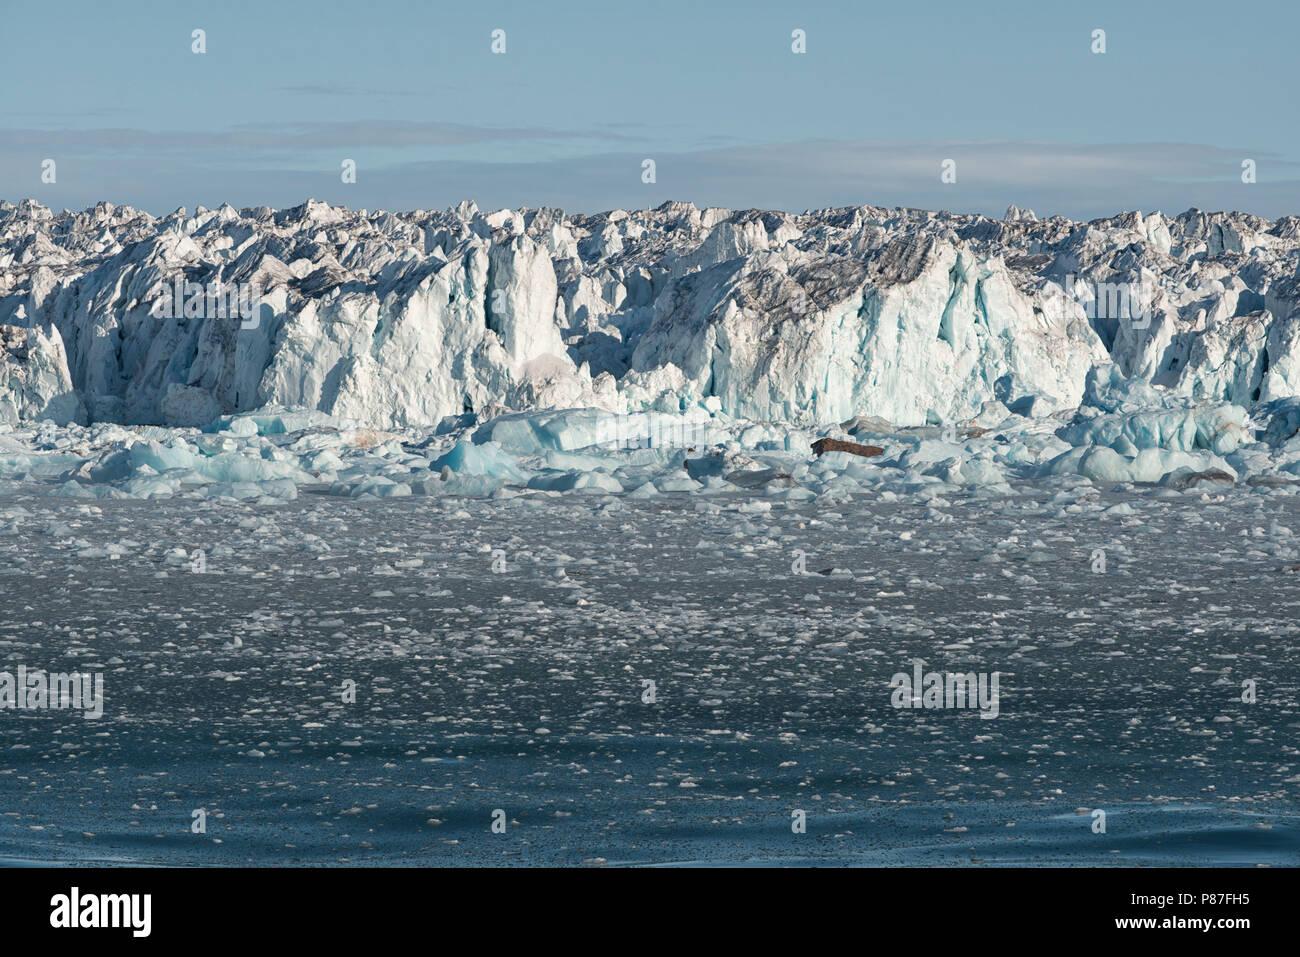 Edge of the arctic ice cap Austfonna, on Nordaustlandet, Svalbard Archipelago, 2017 - Stock Image